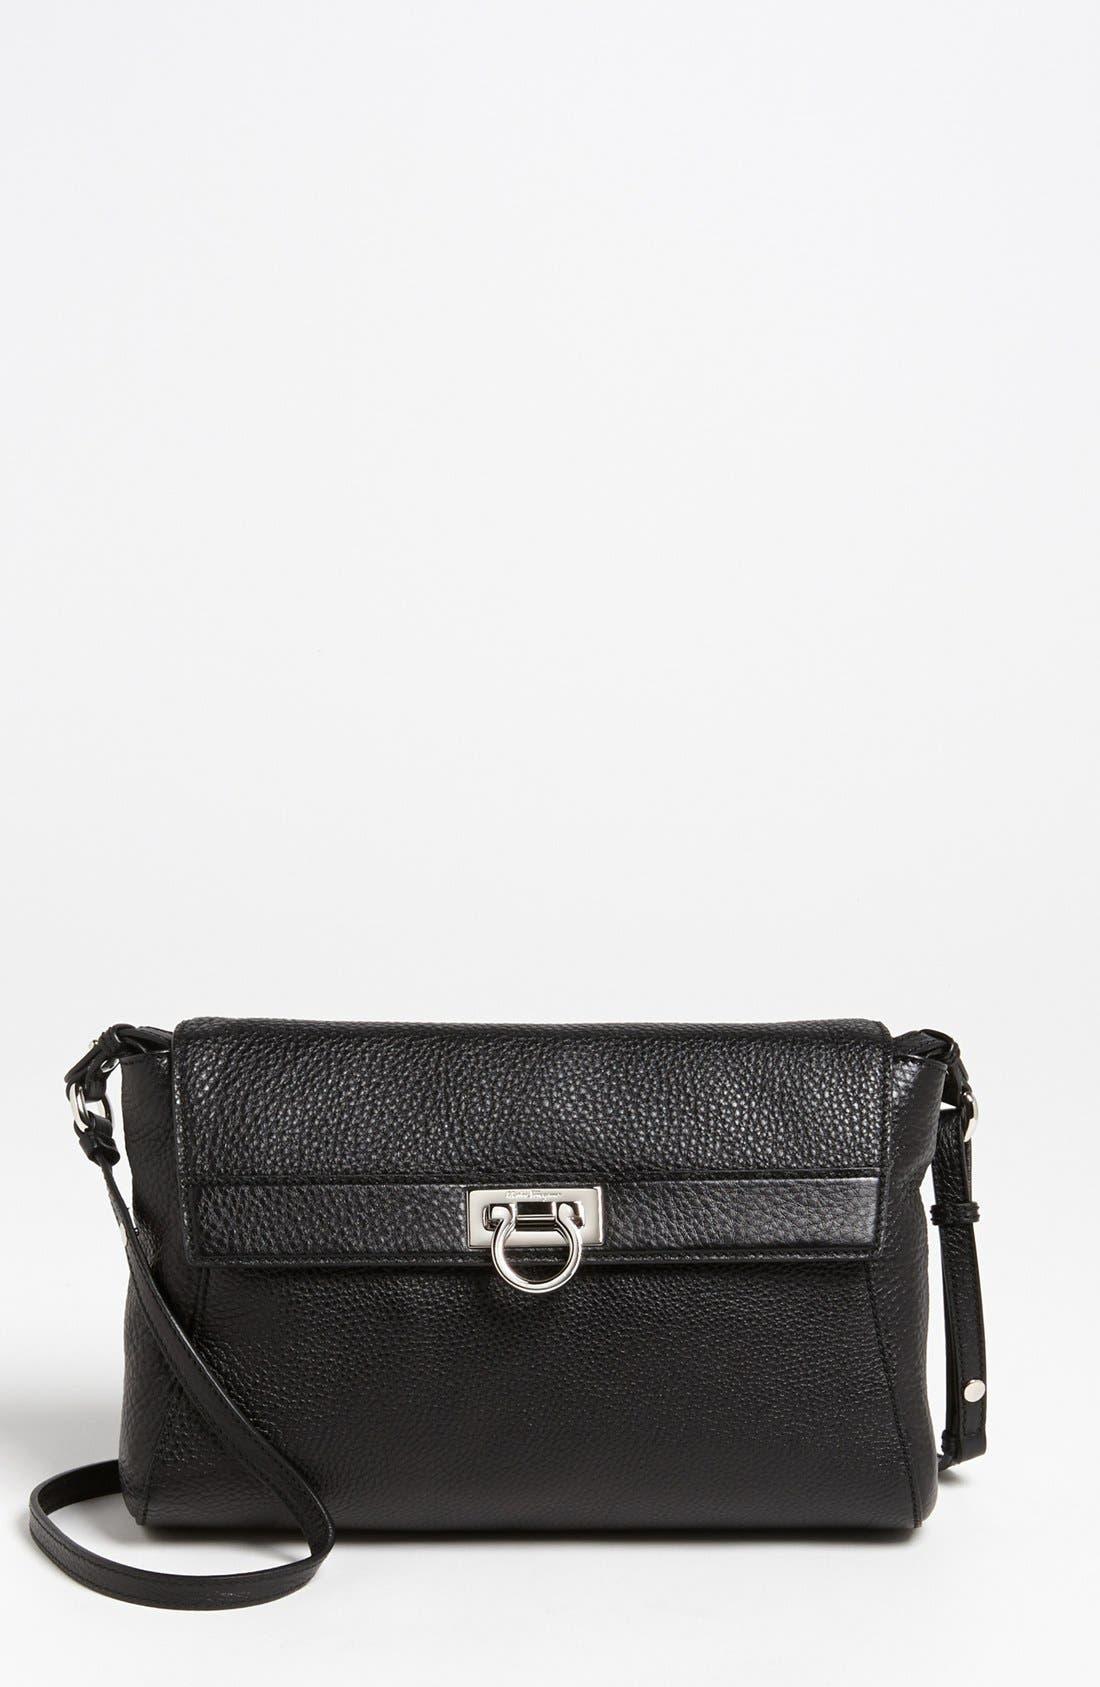 Alternate Image 1 Selected - Salvatore Ferragamo 'Small Abbey' Leather Crossbody Bag